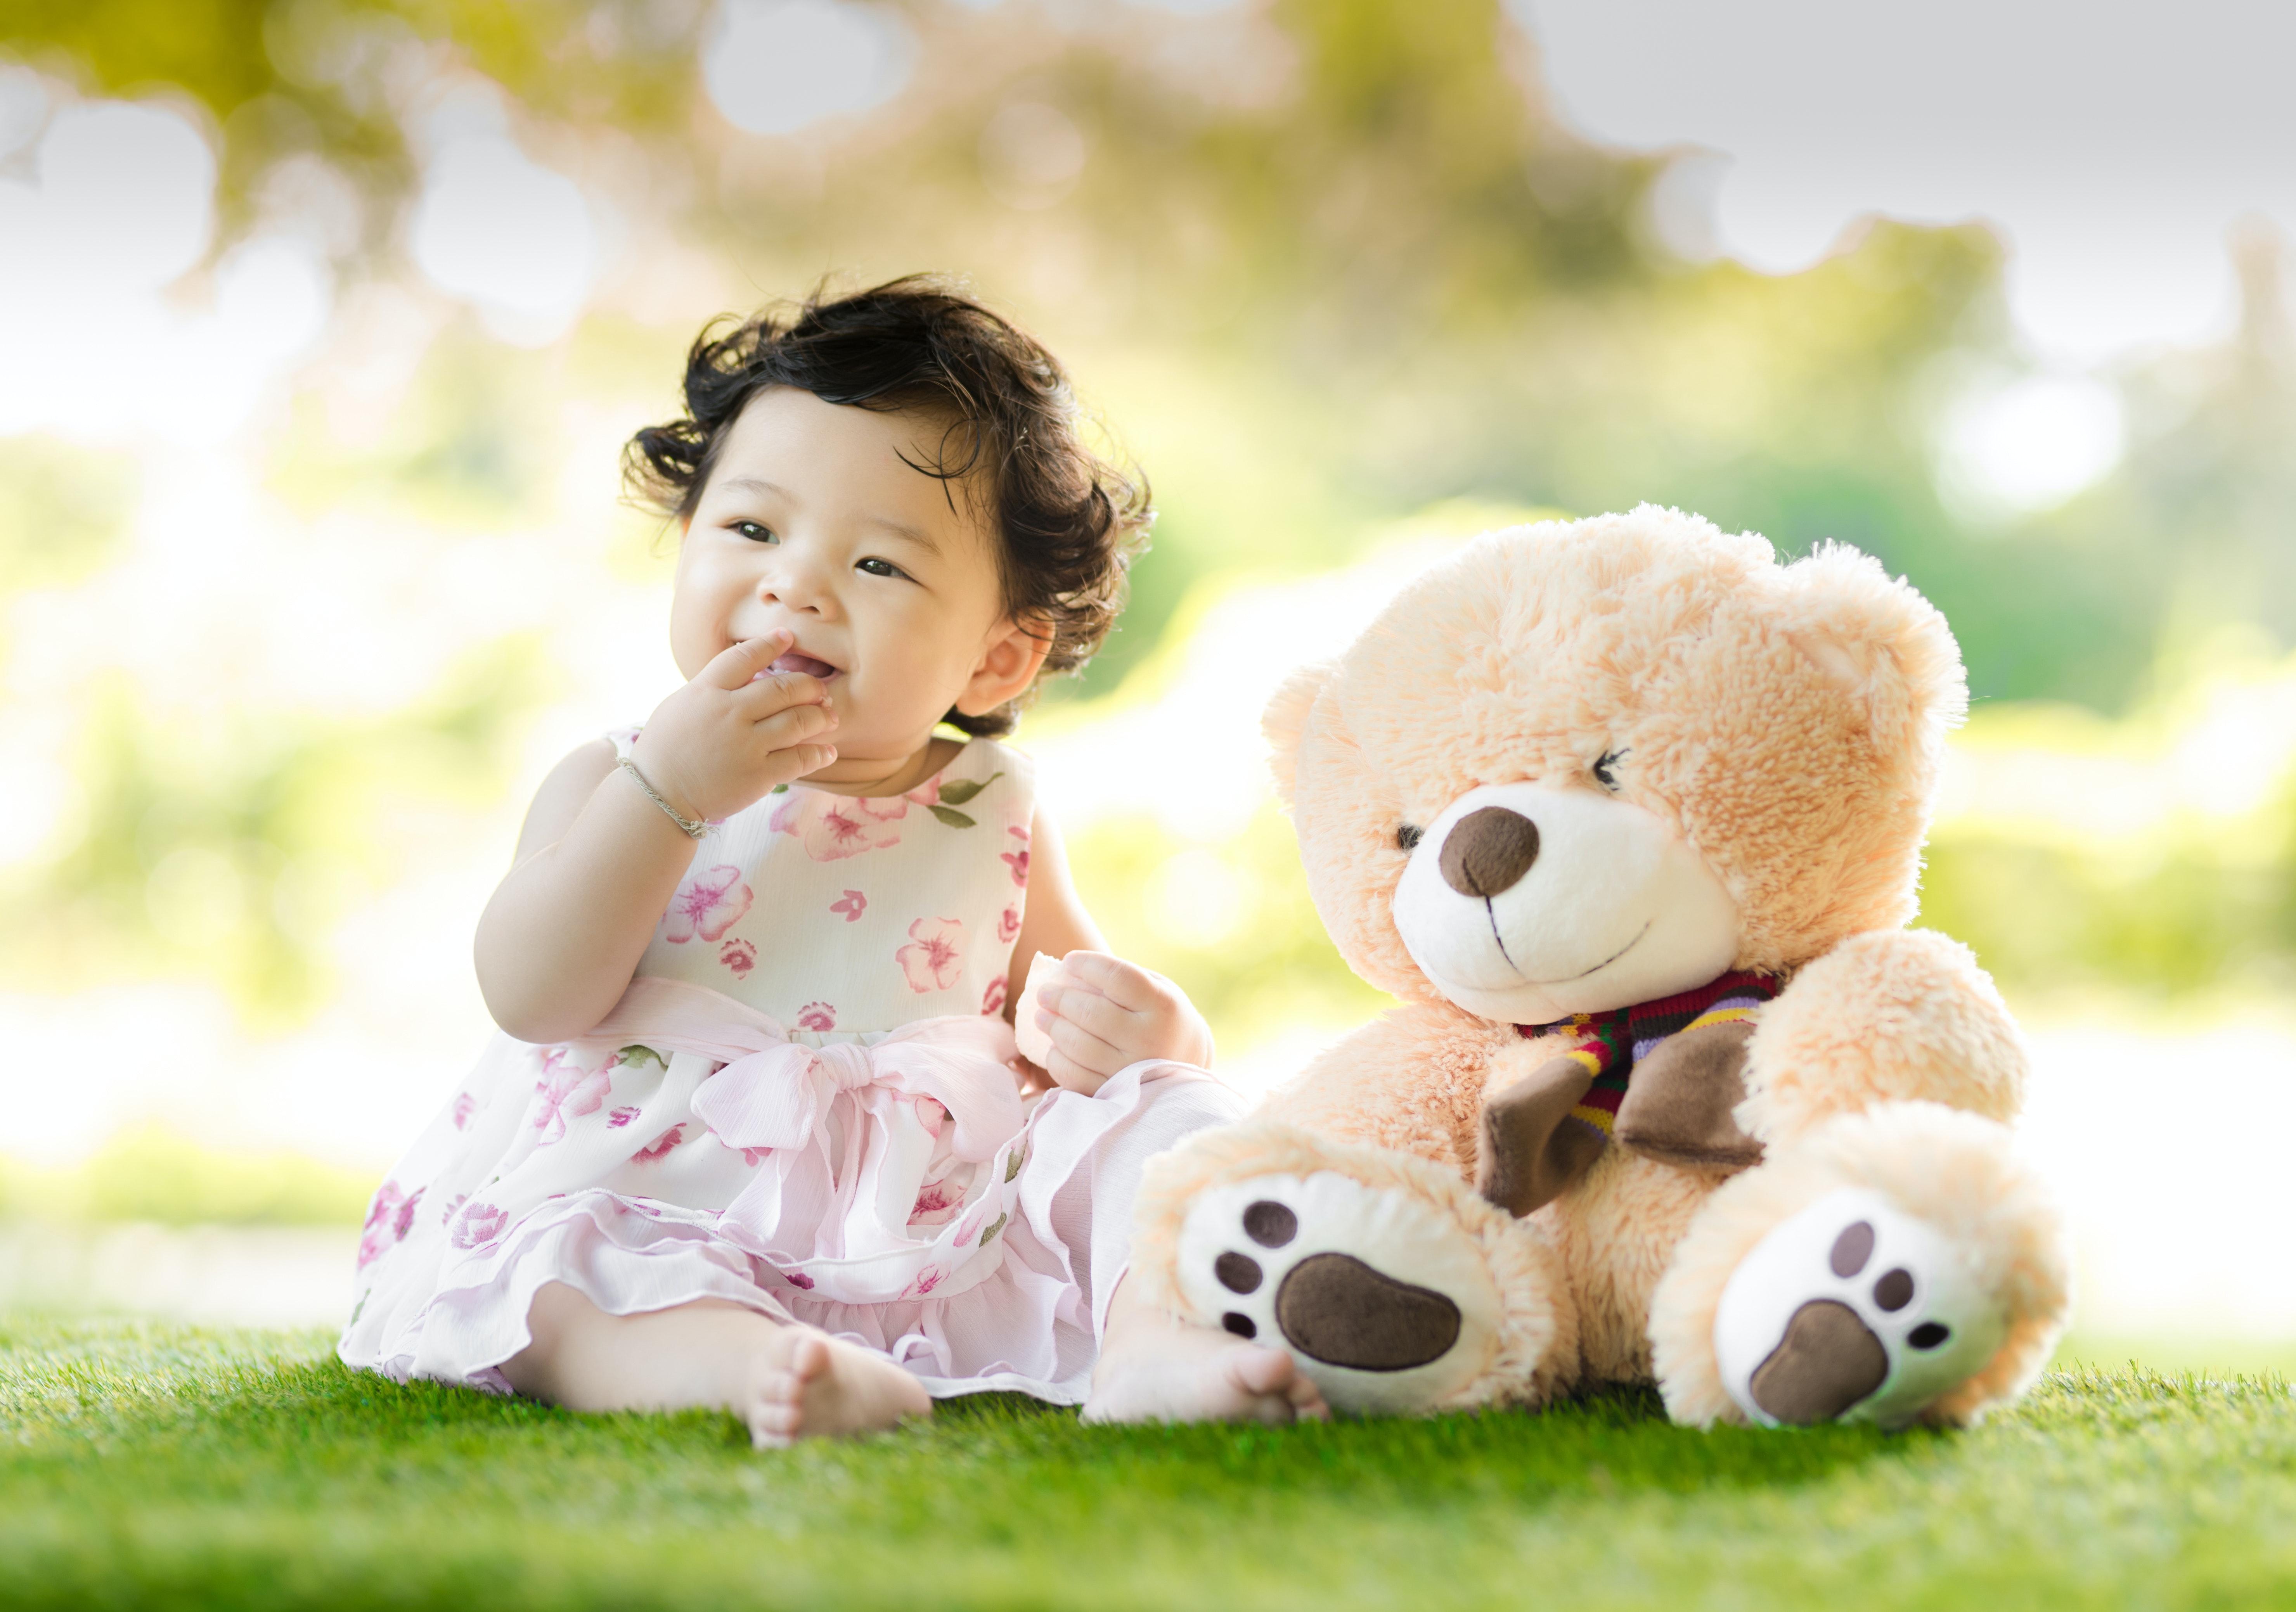 33908e551 1000+ Amazing Baby Background Photos · Pexels · Free Stock Photos